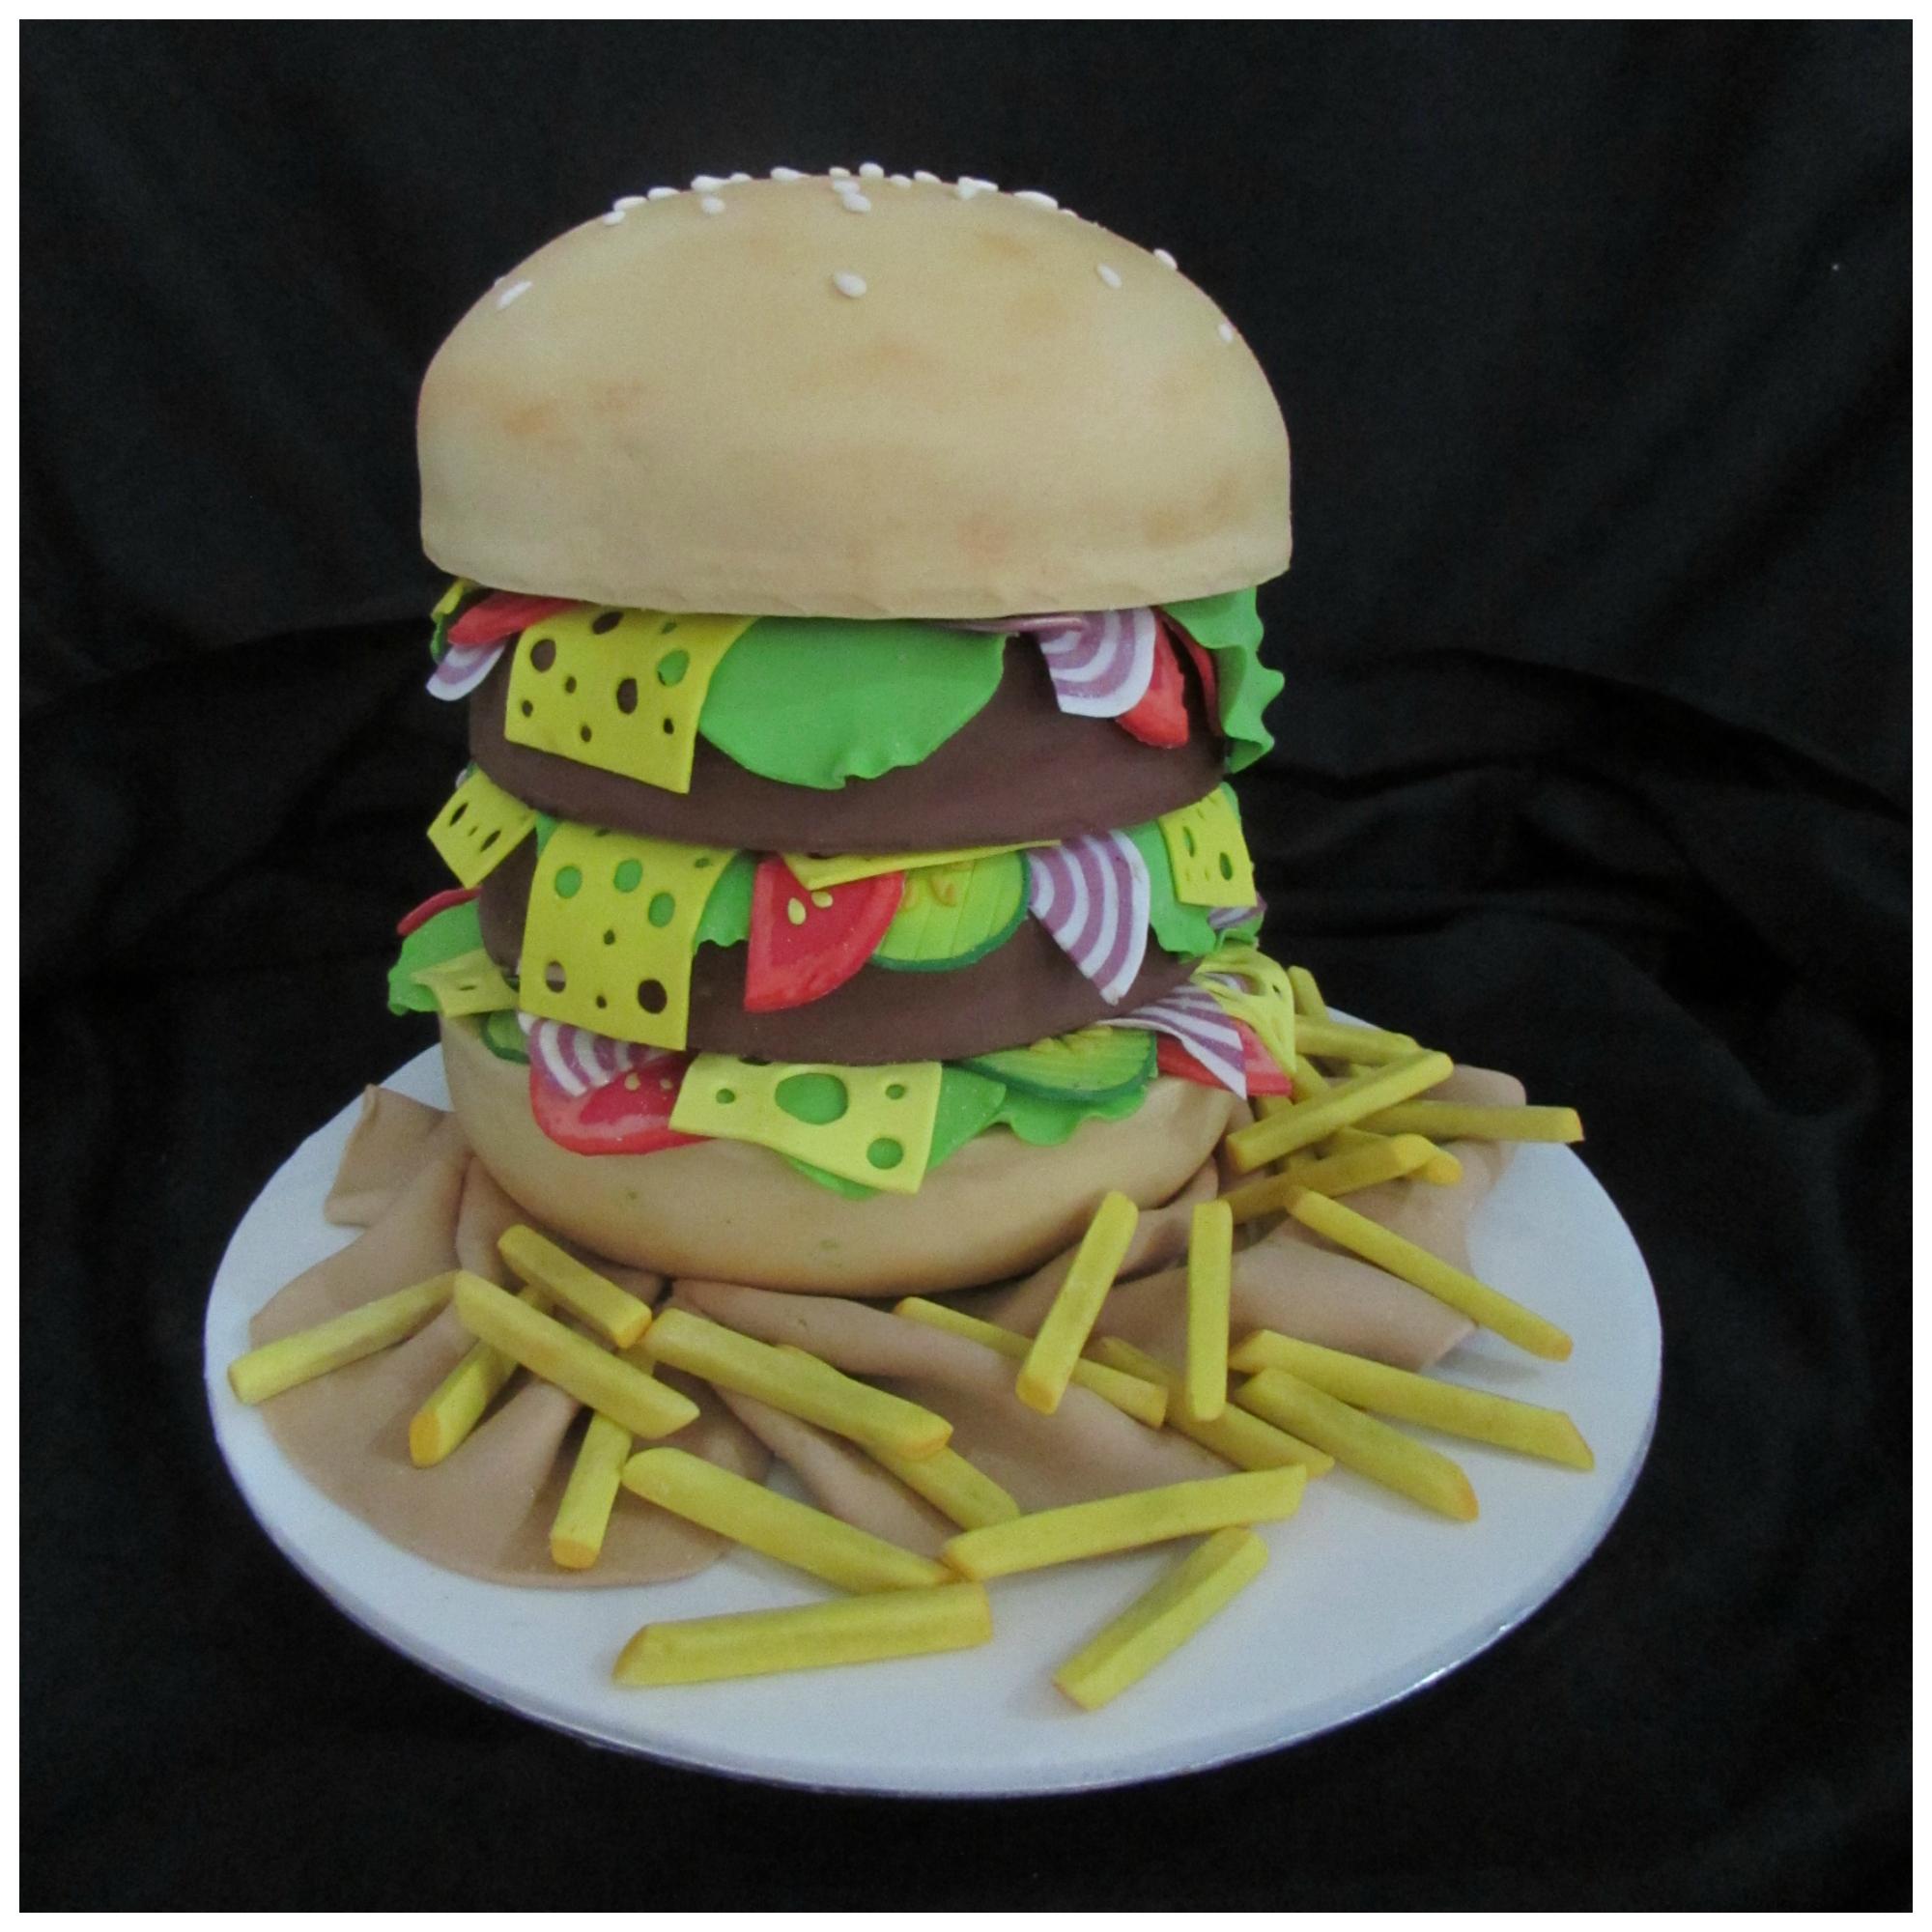 The Hamburger Cake